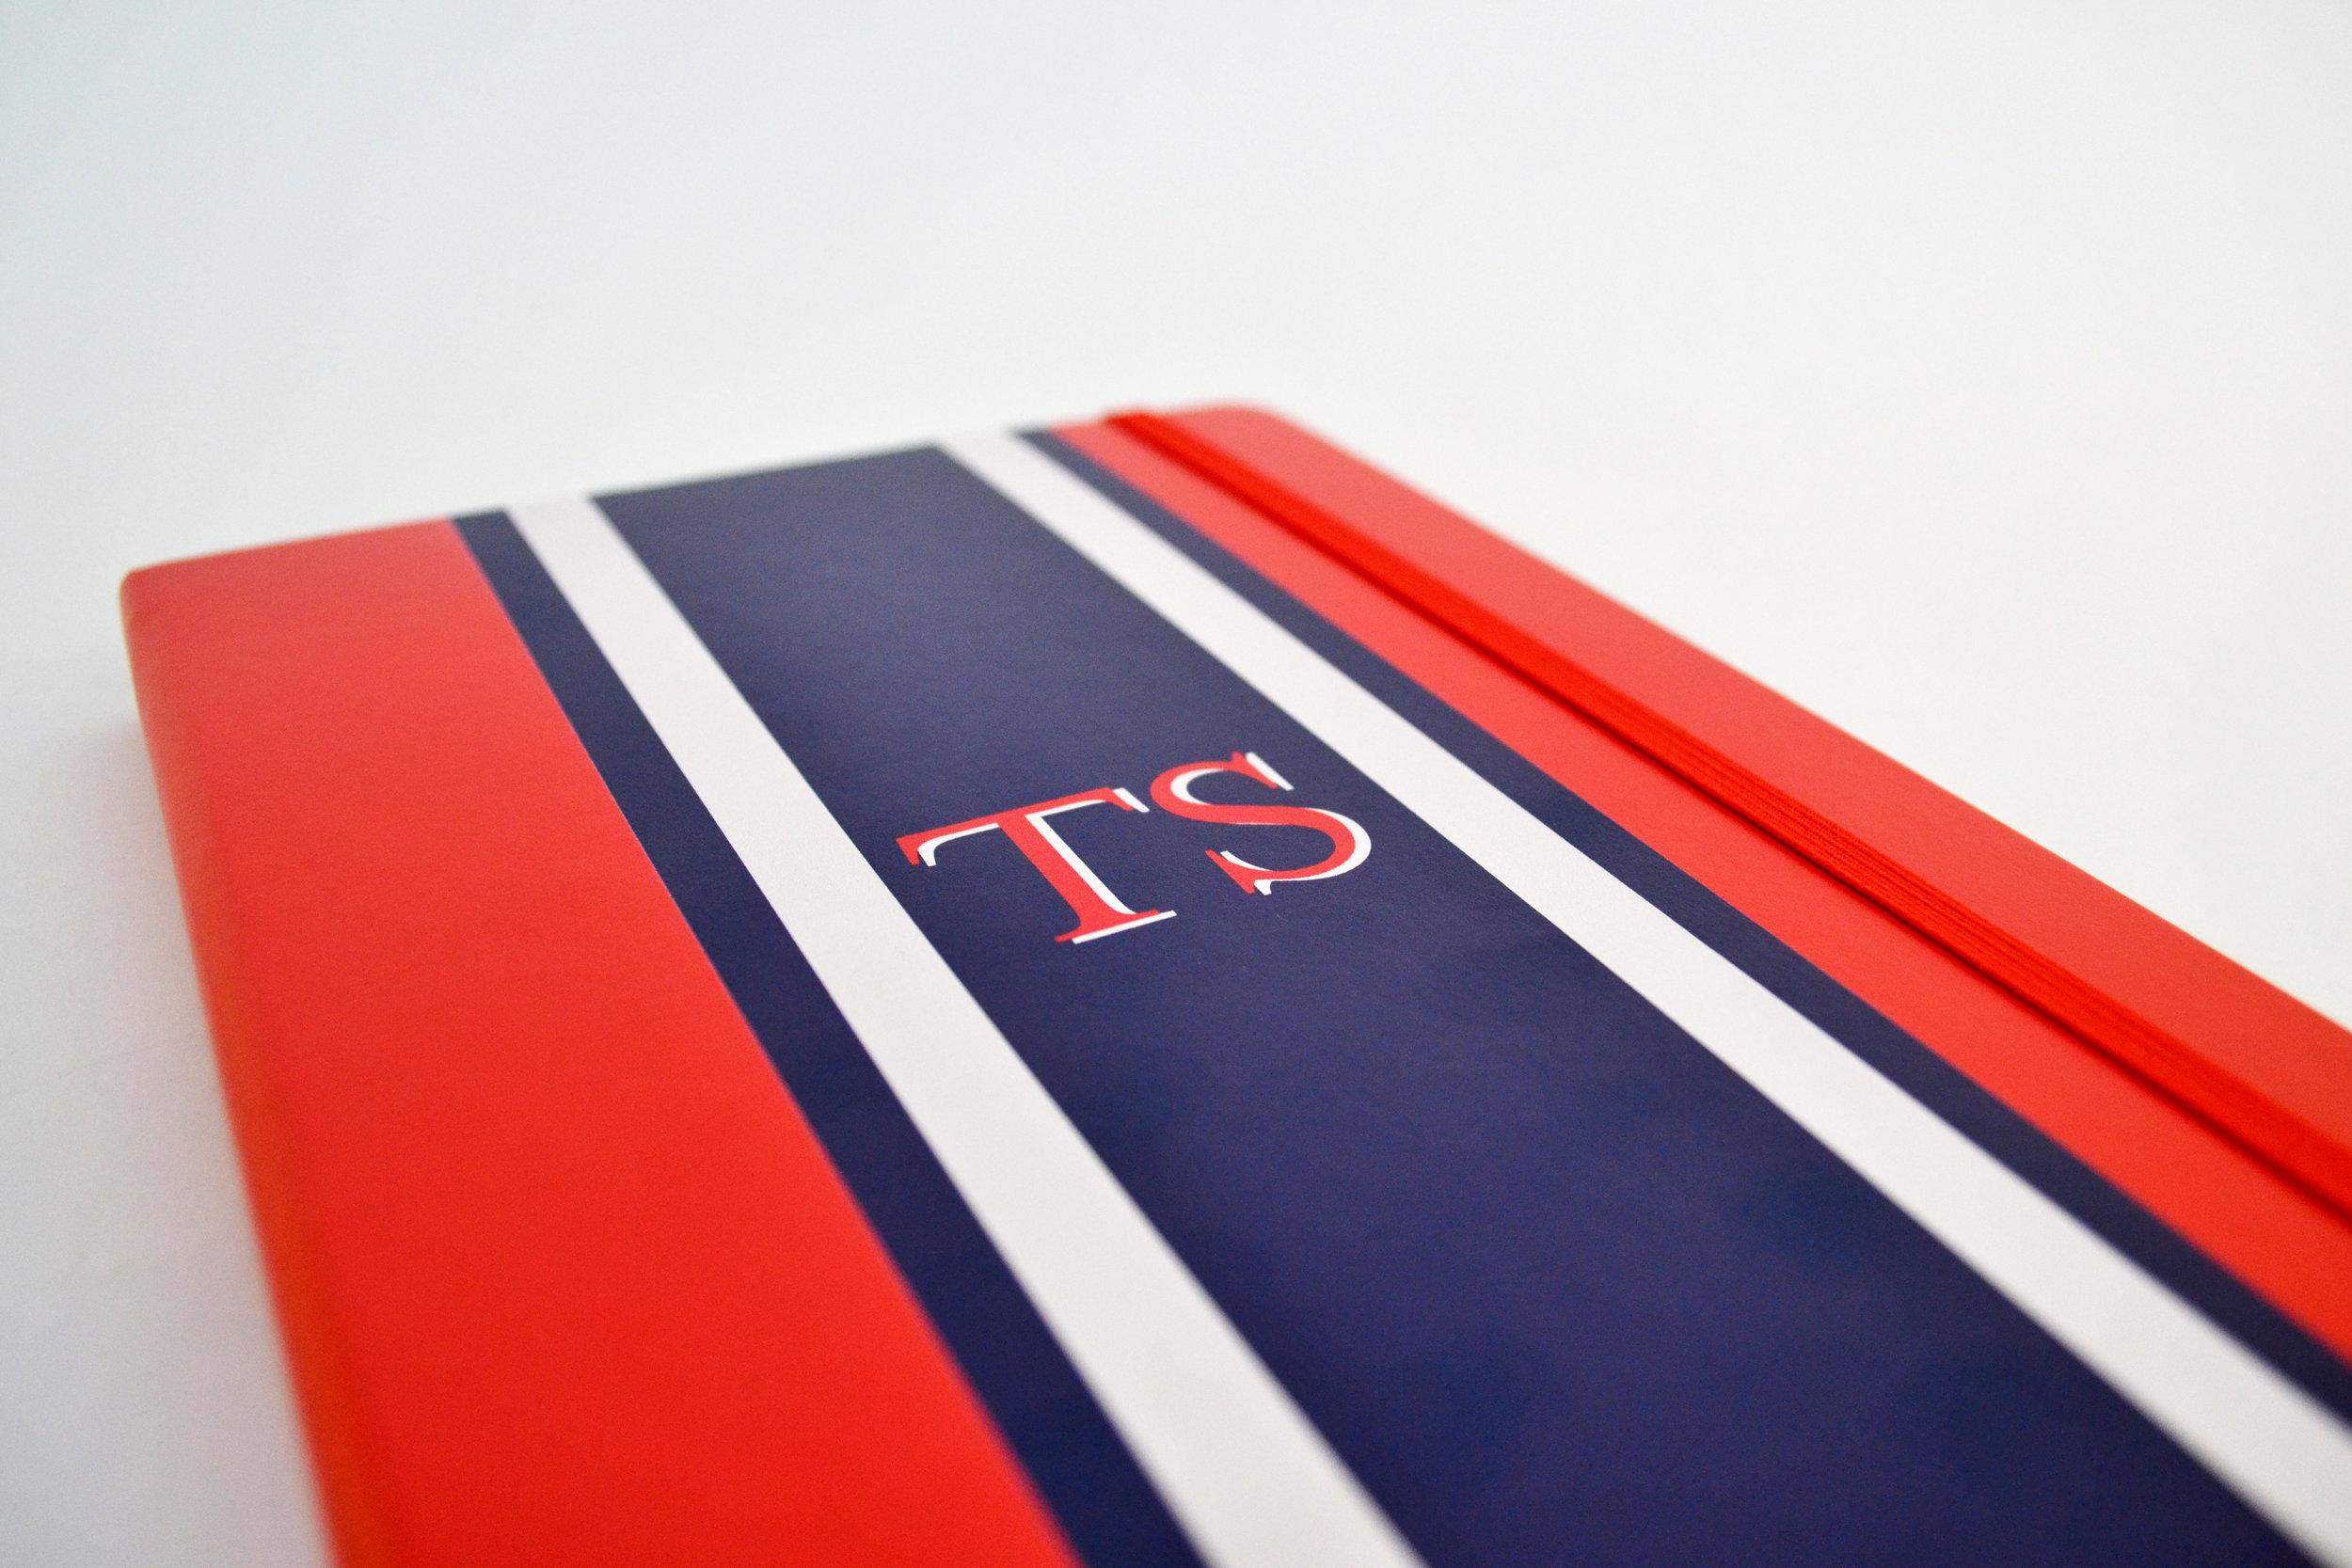 ts_05.jpg